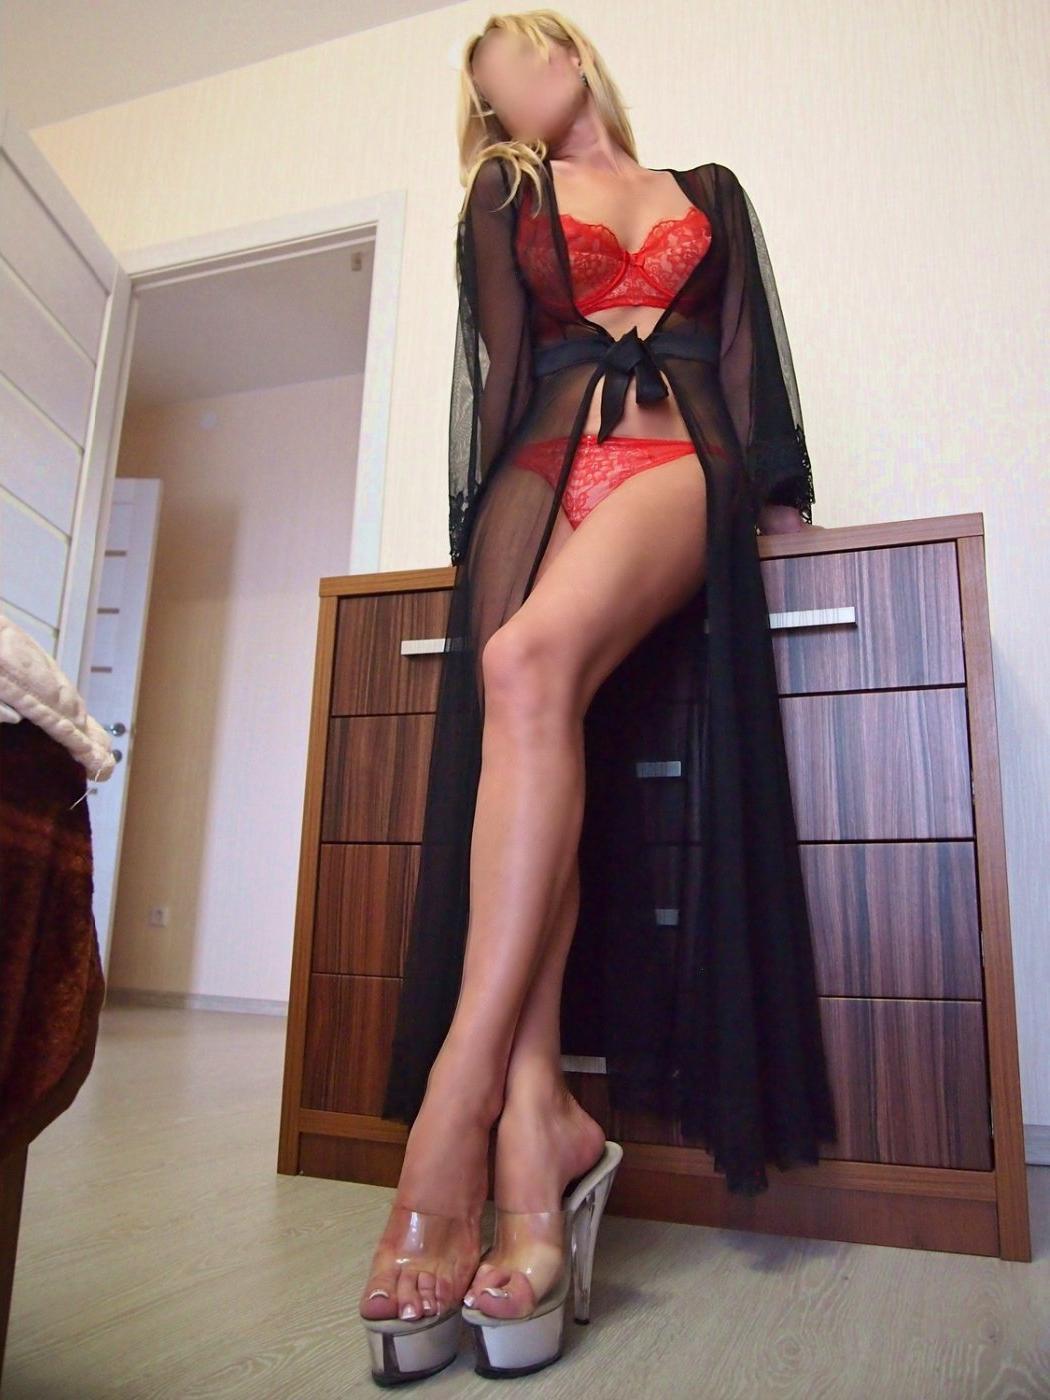 Проститутка Илона, 40 лет, метро Библиотека имени Ленина